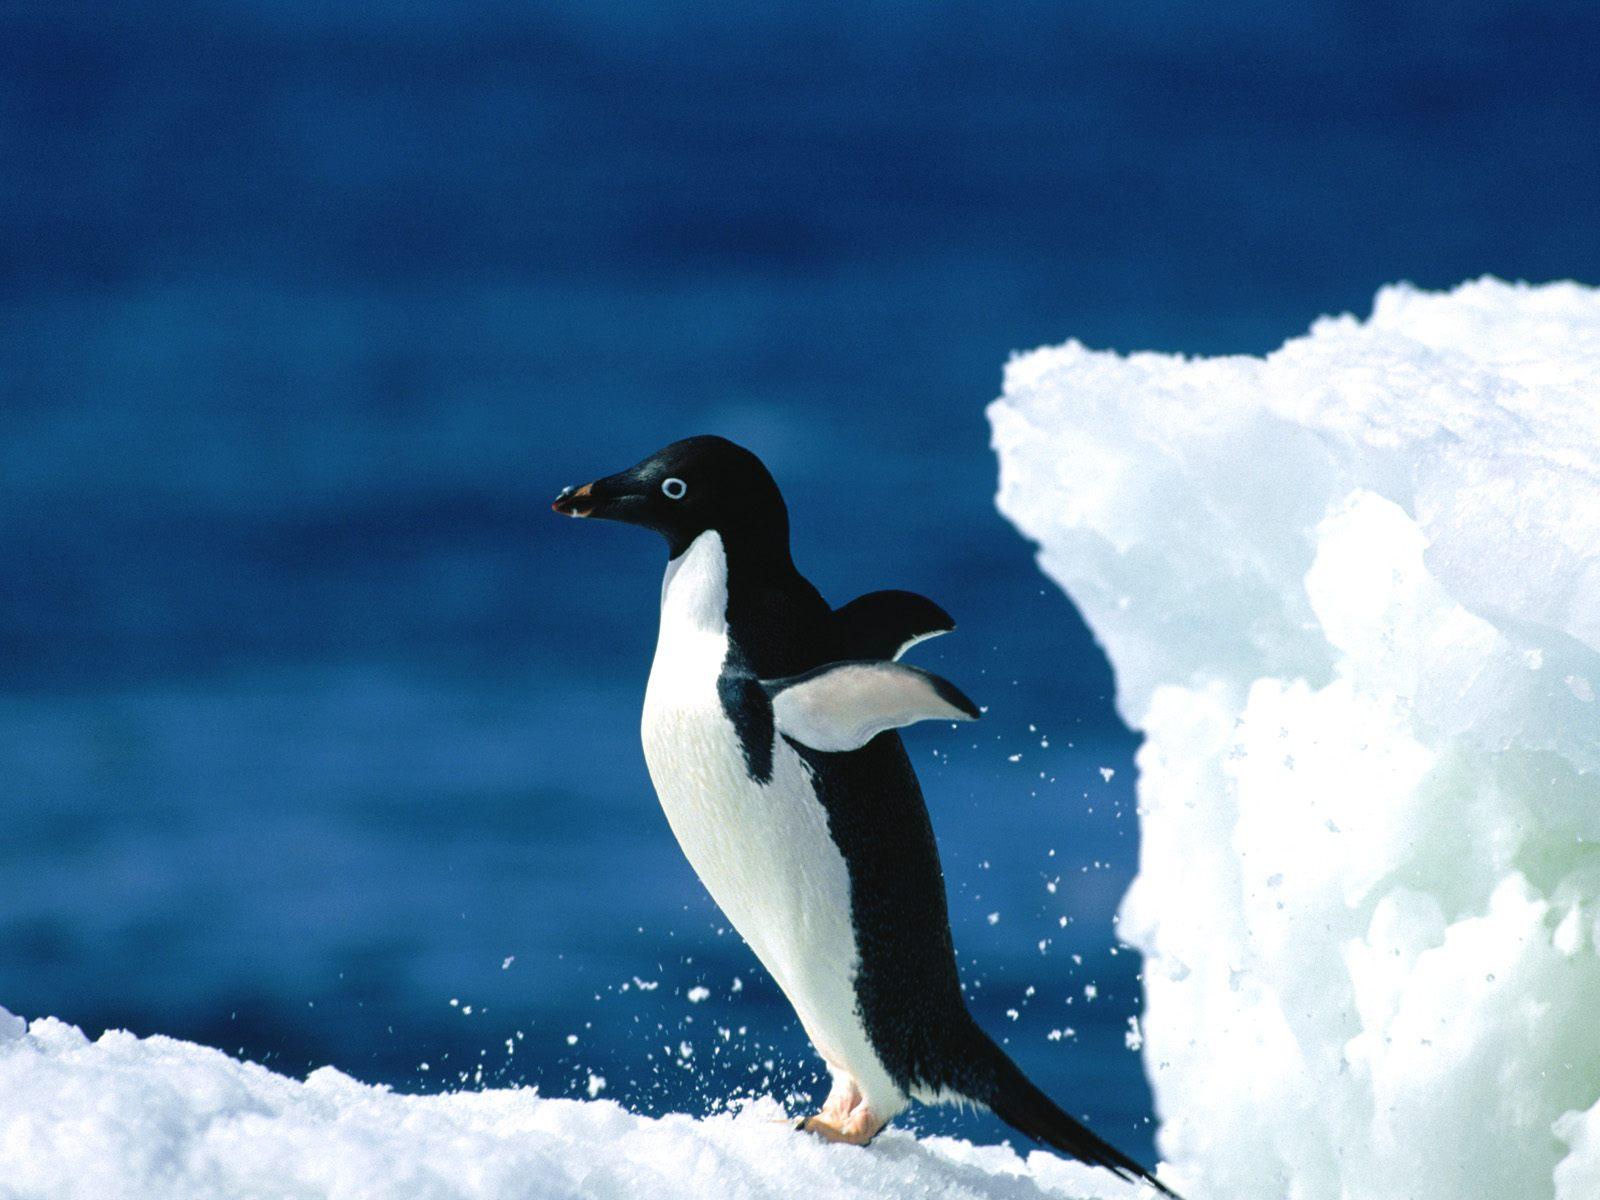 cute Penguin Love Wallpaper : ???? --- ??????1600*1200 High resolution penguin wallpapers3